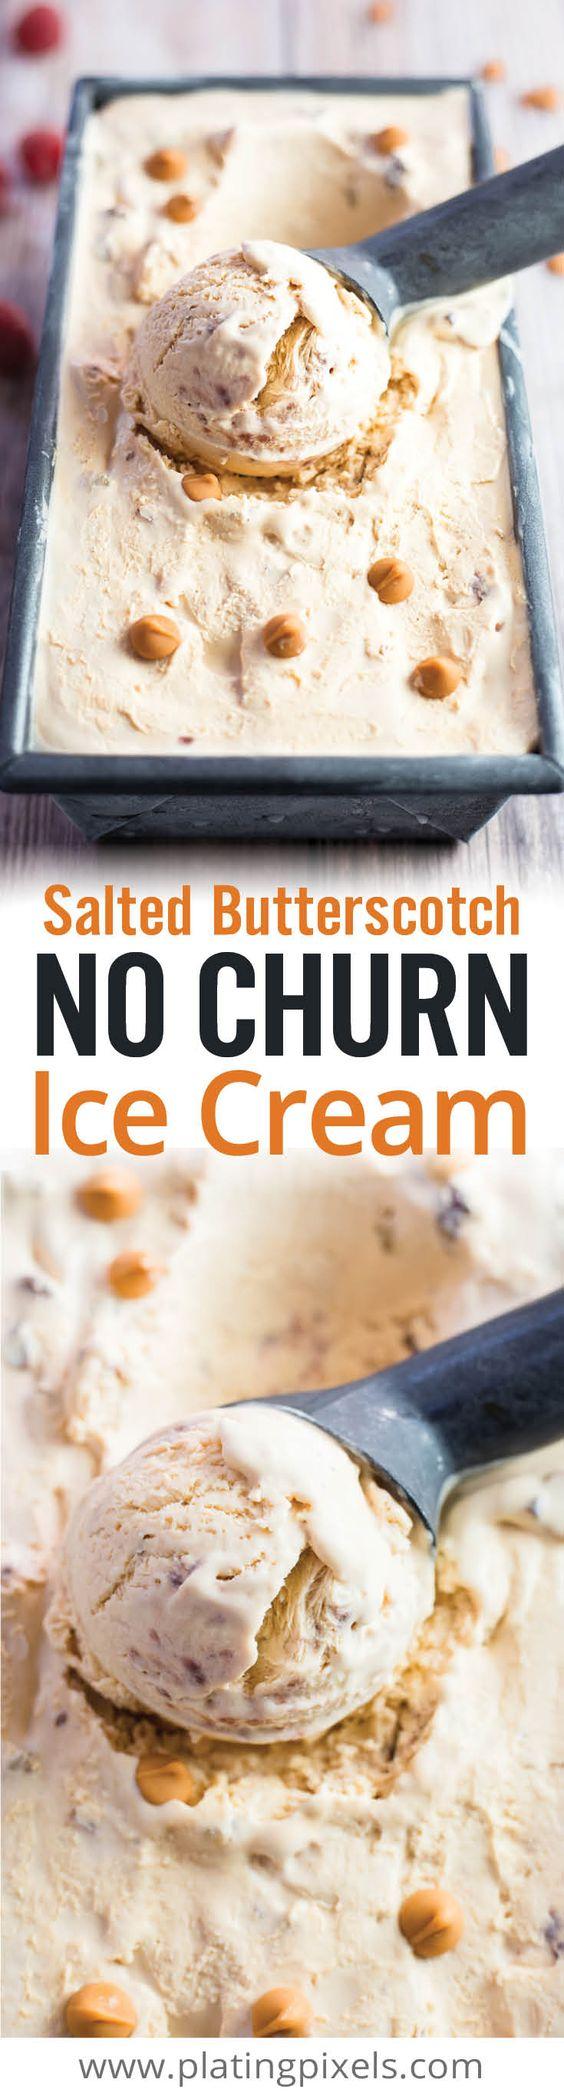 Hassle free Butterscotch No Churn Ice Cream. You don't even need an ice cream maker! Butterscotch chips, raspberry preserves, pecans, egg yolk, whole mil and whipped cream make creamy, dreamy ice cream. Vegetarian and gluten free recipe. #sp www.platingpixels.com